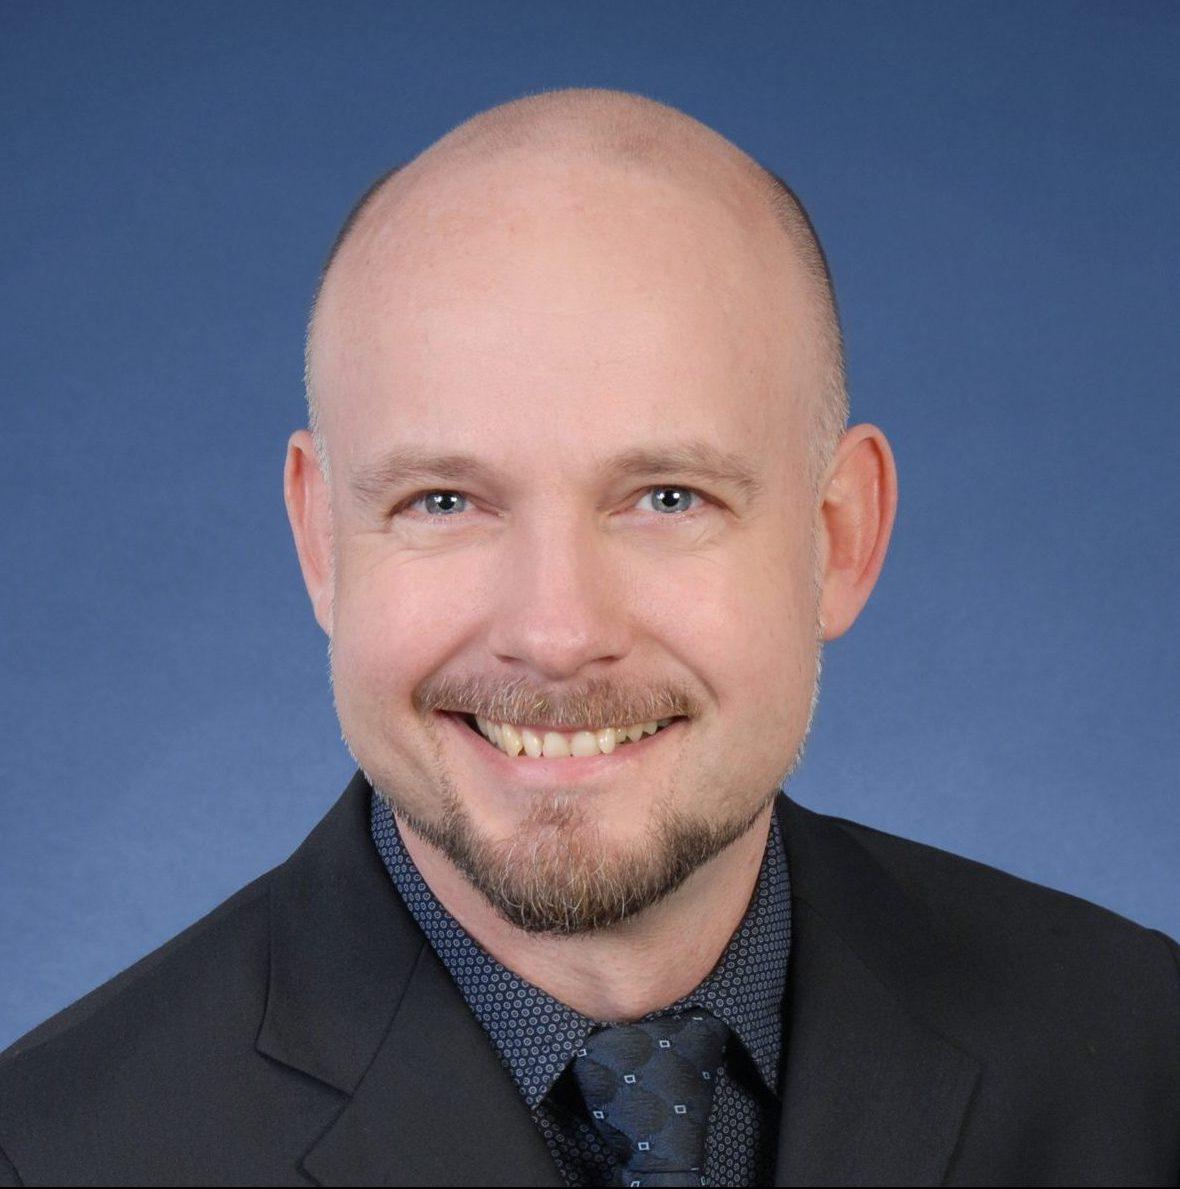 Daniel Kresse